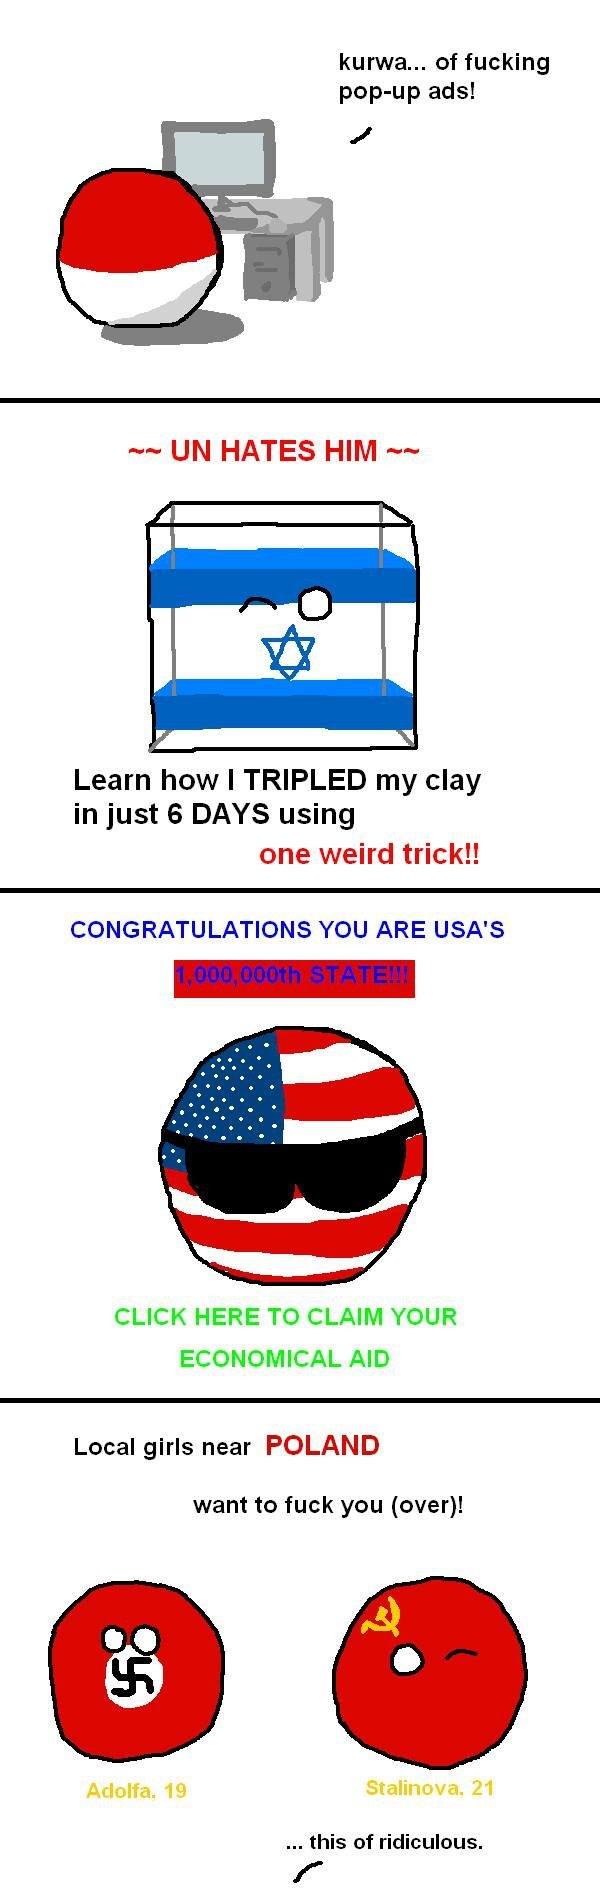 Internet Adds. Polandball version. kurwa... of fucking poppop ads! m UN HATES HIM '9. Learn how I TRIPLED my clay in just is DAYS using one weird trick!! CONGRA Polandball israelcube usaball naziball sovietball